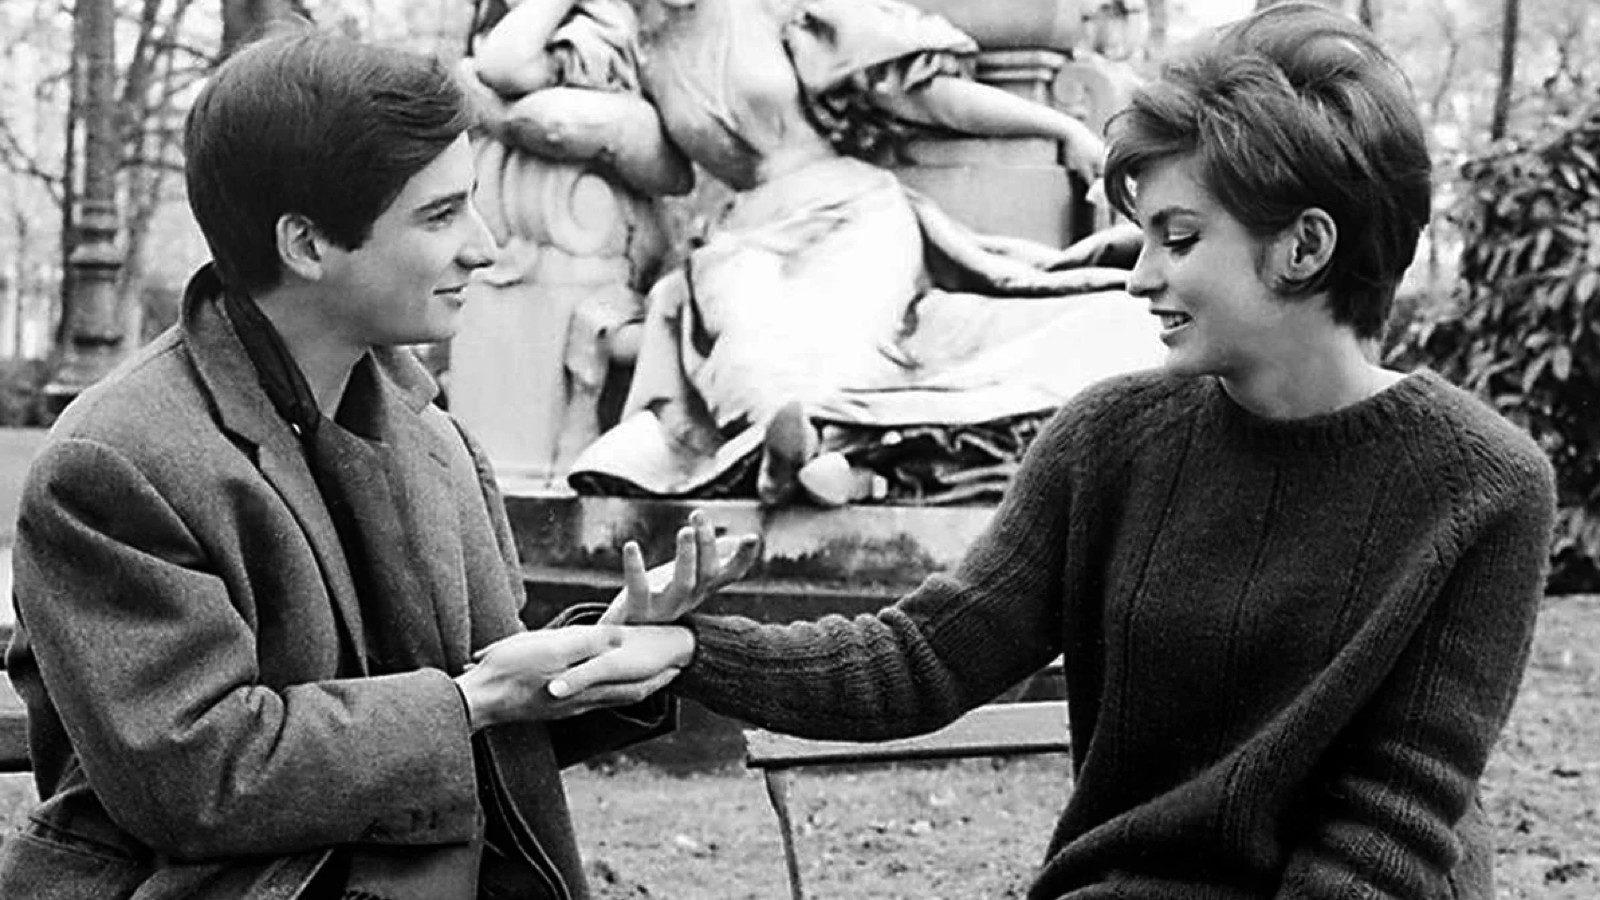 Escena del cortometrage Antoine et Colette